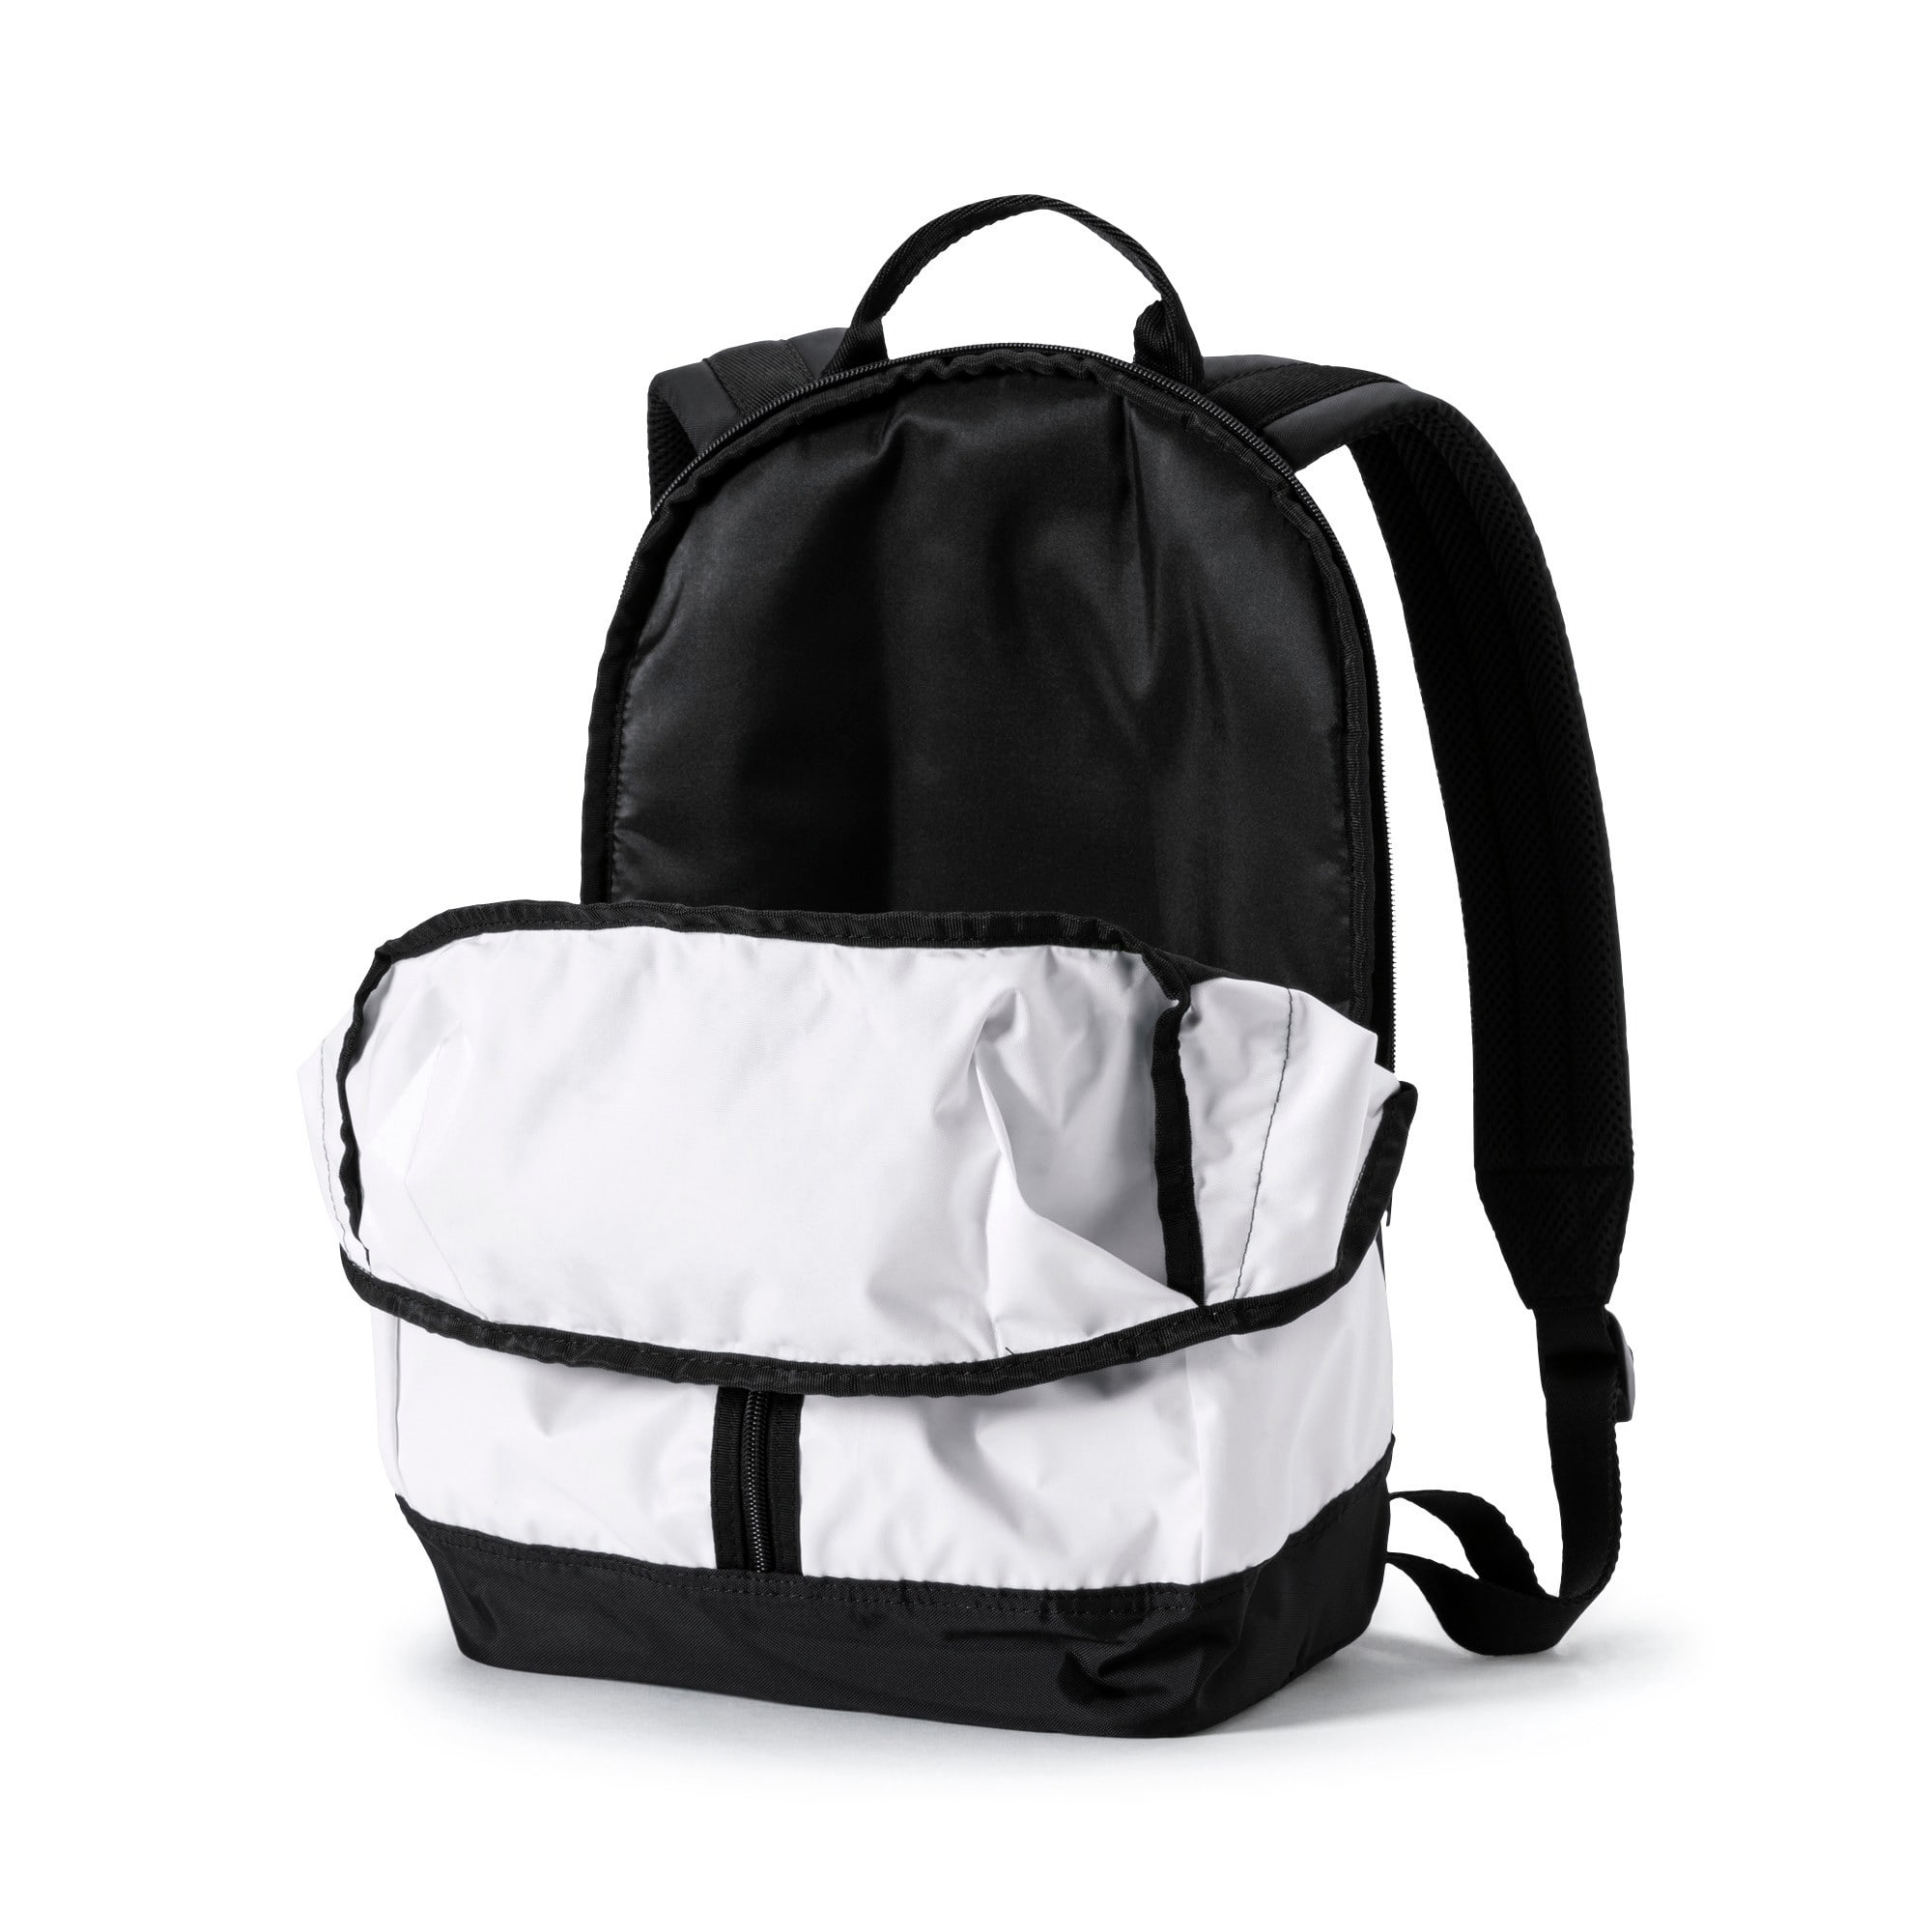 Thumbnail 3 of Ambition Gold Women's Backpack, Puma White-Puma Black, medium